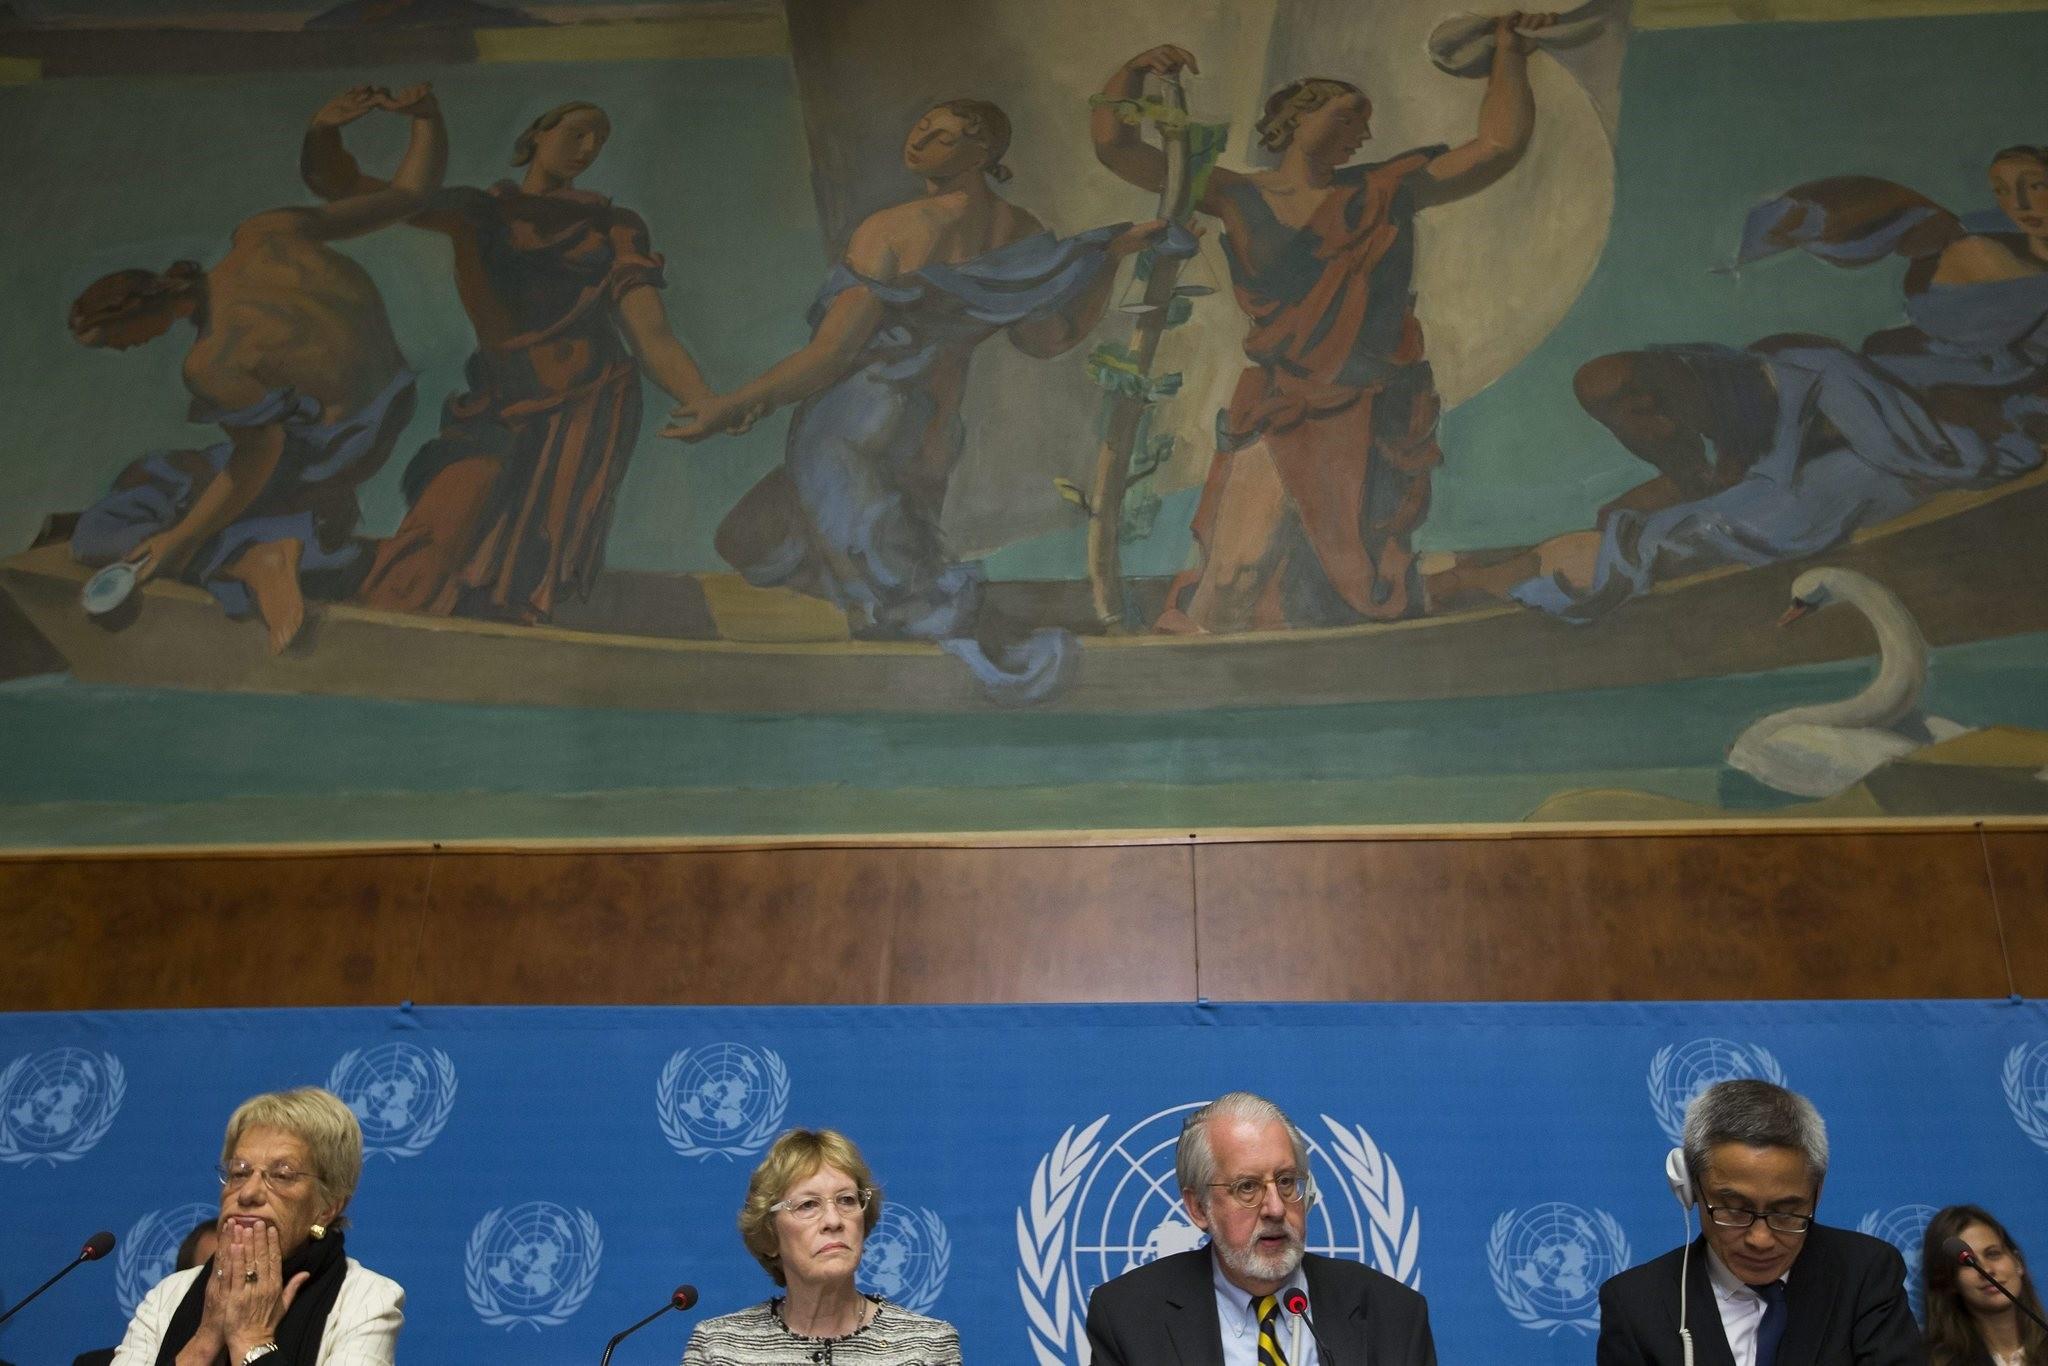 (L-R) Switzerland's Carla del Ponte, US Karen Koning Abuzayd, and Thailand's Vitit Muntarbhorn, at the the United Nations in Geneva, Switzerland, 16 September 2013. (EPA Photo)